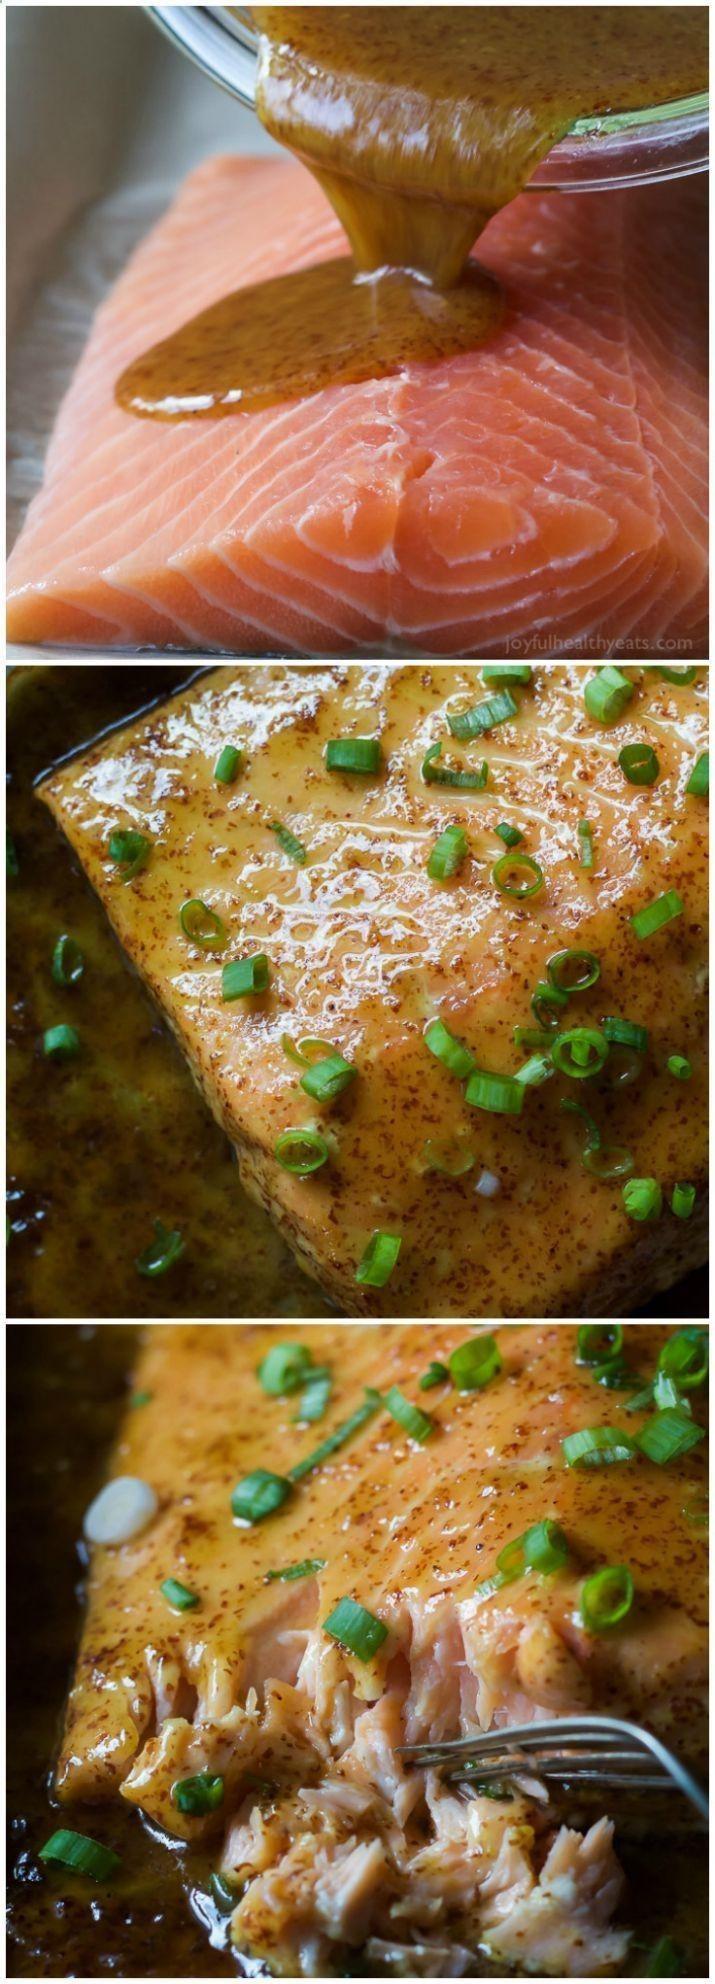 Low Cholesterol Salmon Recipes  Lower Cholesterol Below 100 Dijon Maple Glazed Salmon is